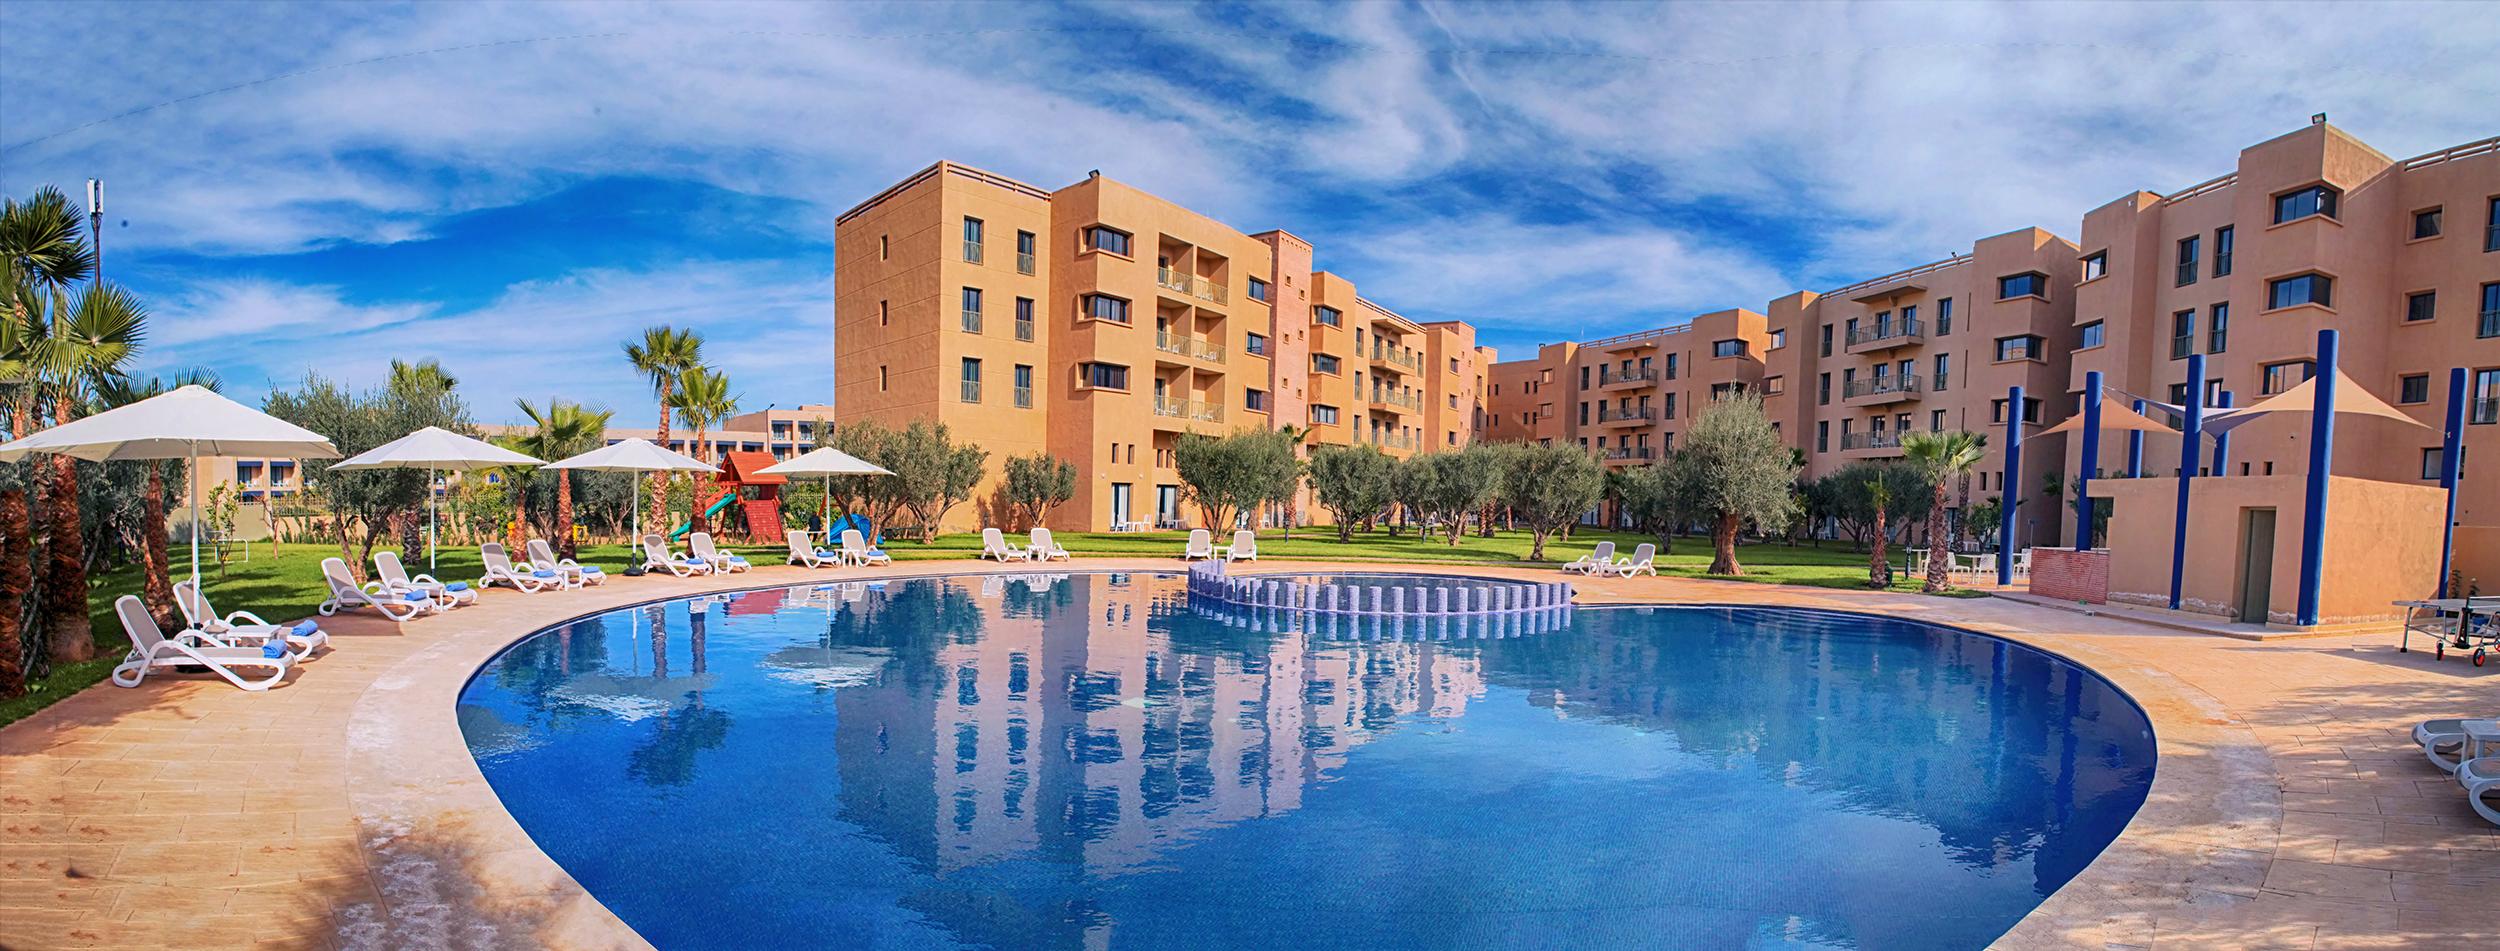 Wazo h tel et appart h tel marrakech site officiel for Appart hotel urban lodge chaudfontaine